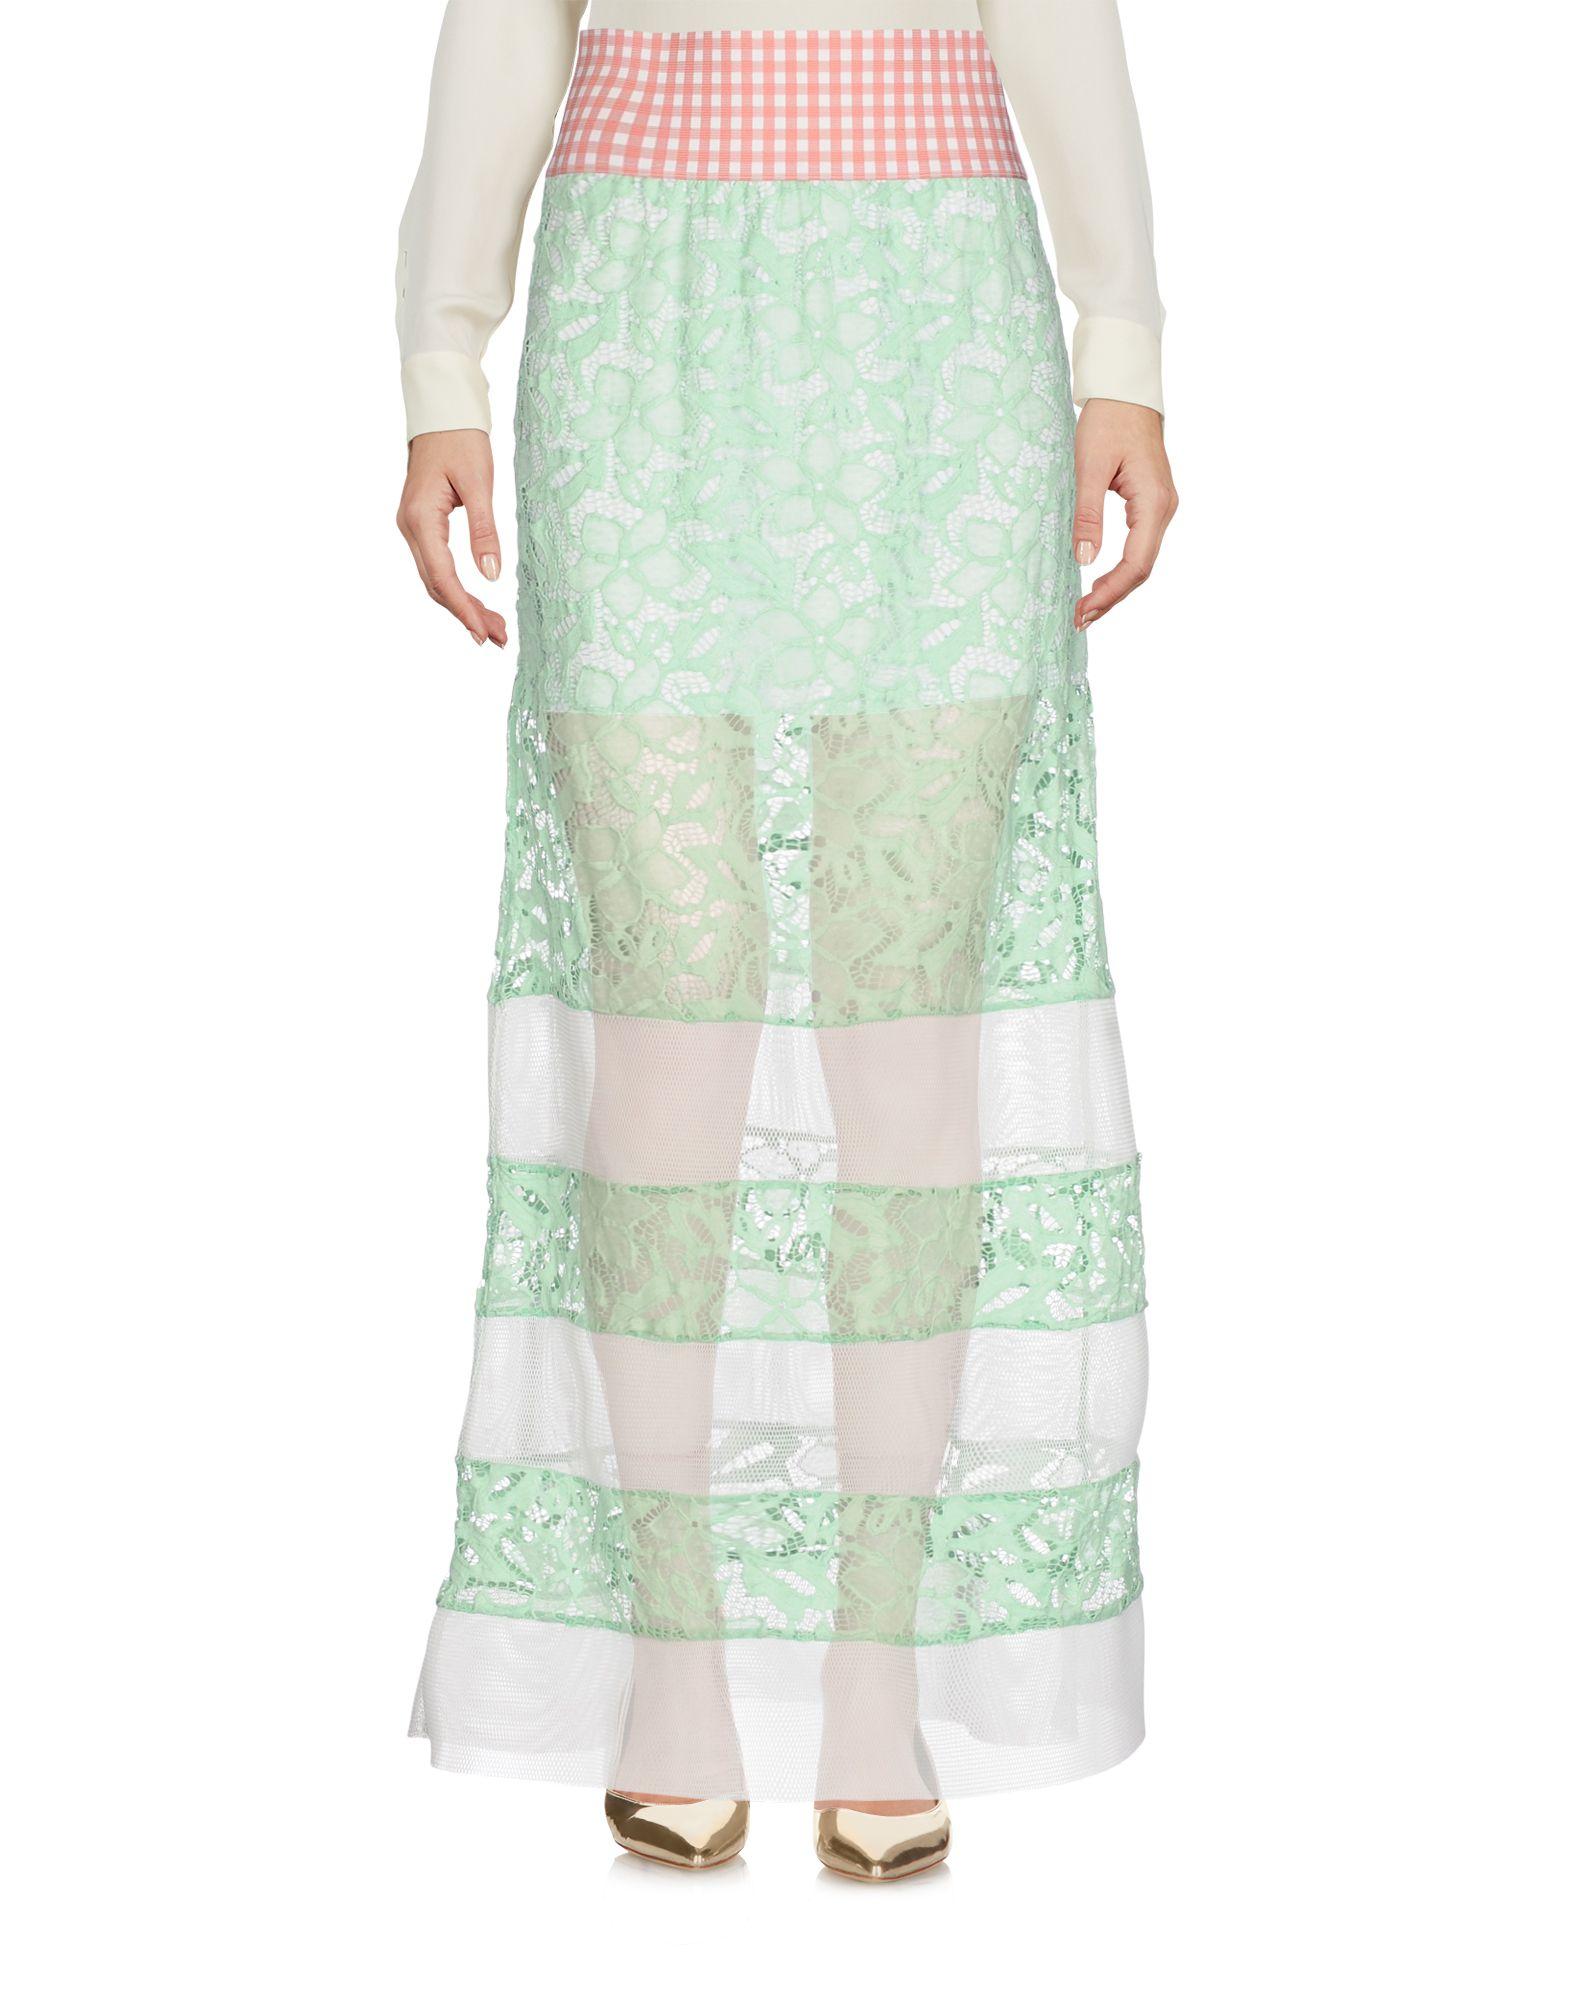 Фото - F**K PROJECT Длинная юбка k 1500